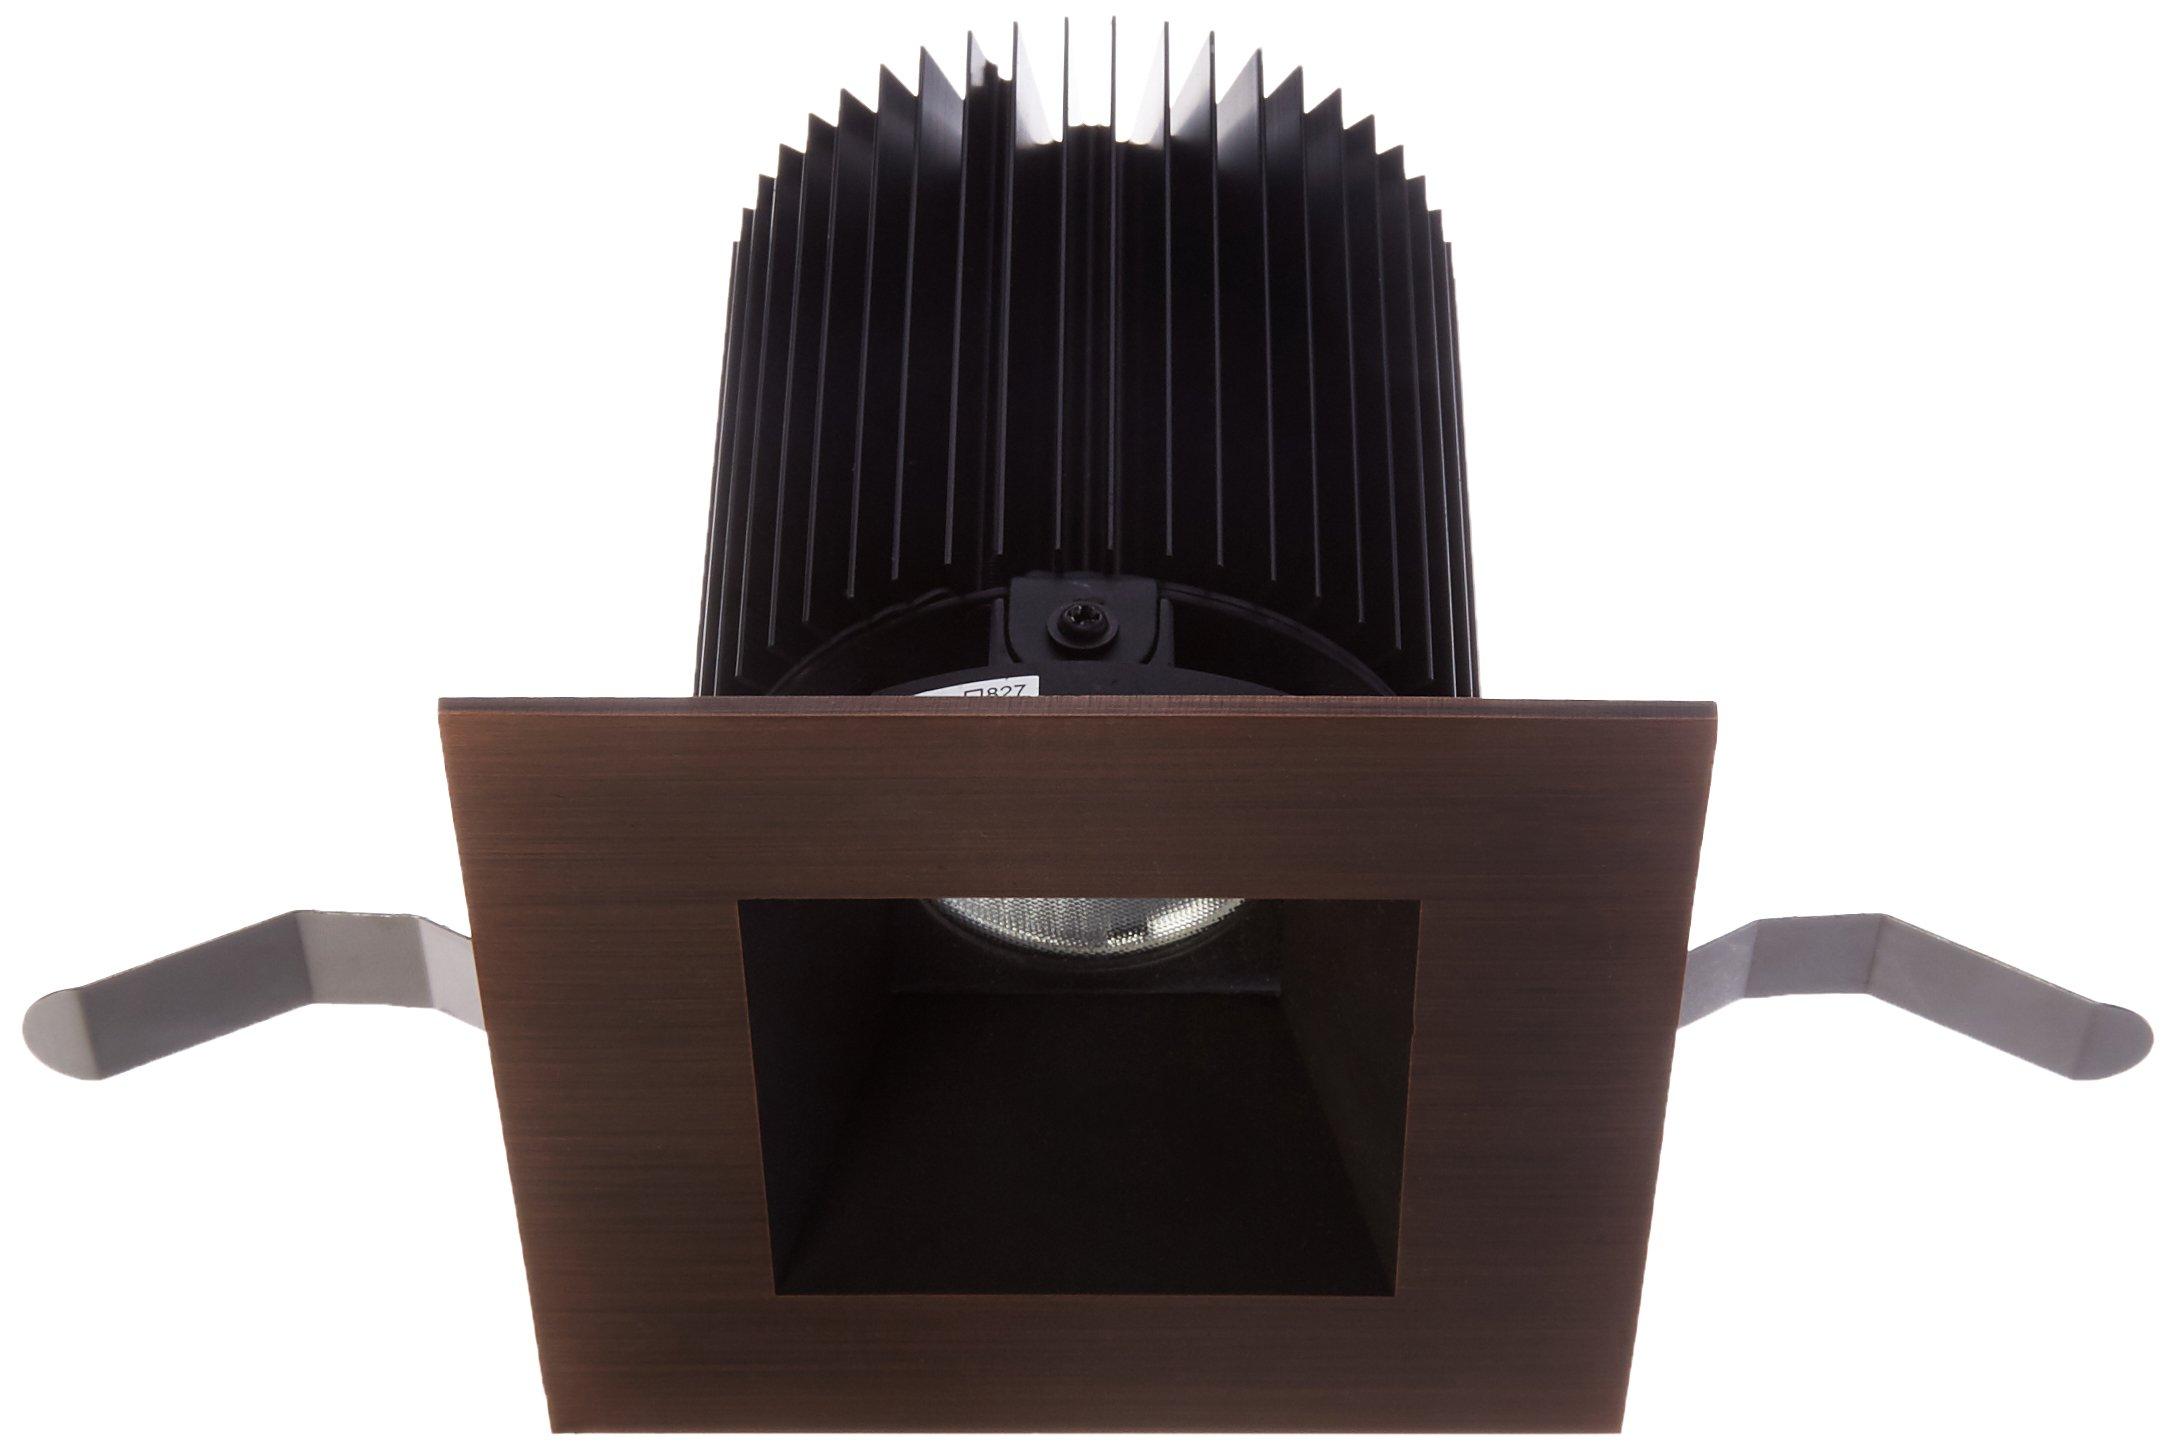 WAC Lighting HR-3LED-T818N-W-CB Tesla LED 3-Inch Square Shower Trim, 28-Degree Angle, 3000K